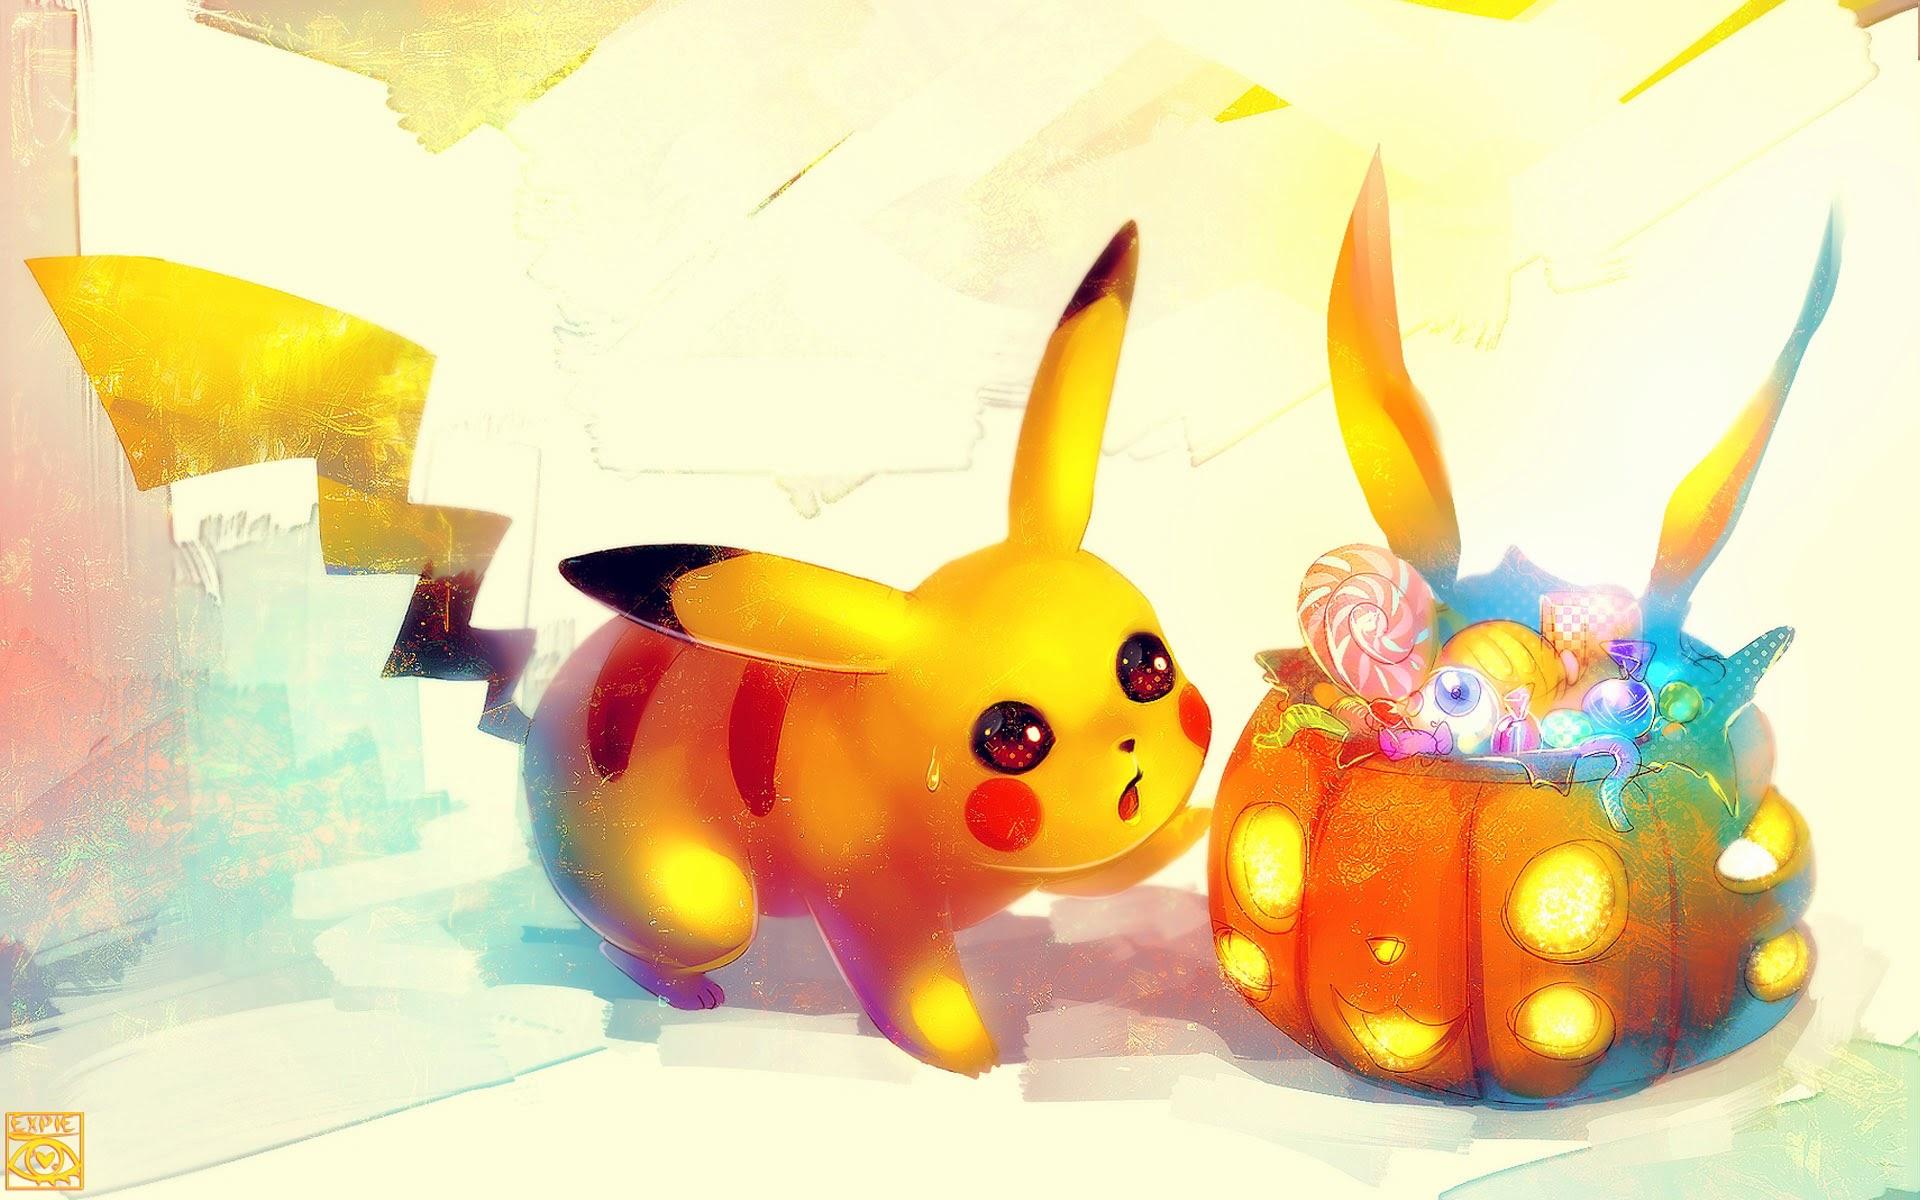 [77+] Pokemon Wallpaper Cute on WallpaperSafari